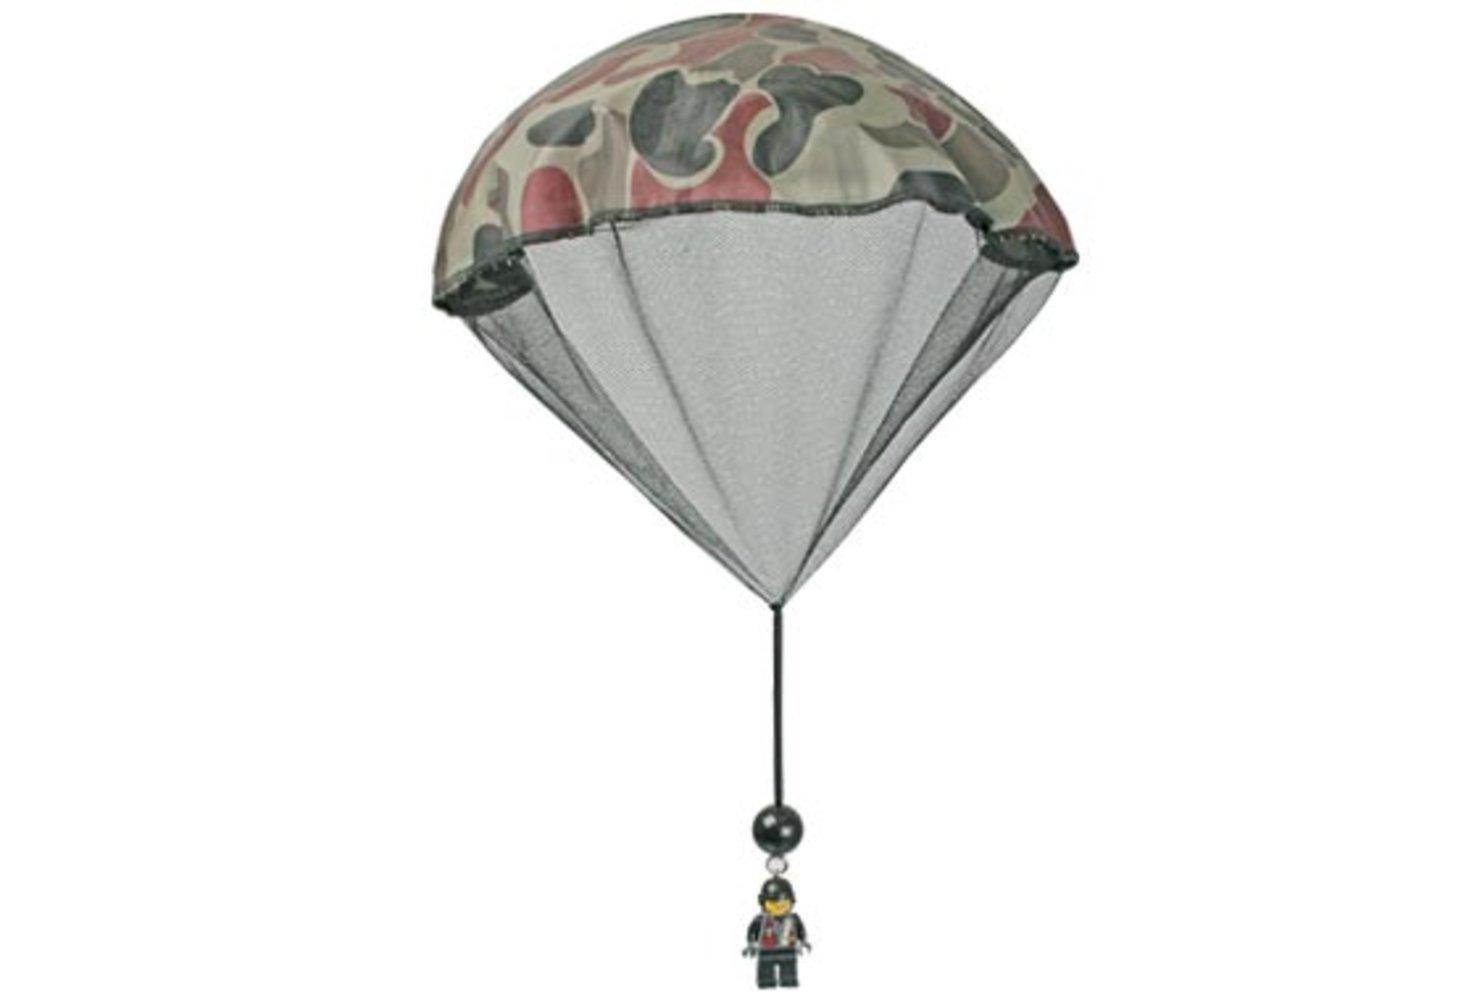 Dino Attack Minifigure Parachute